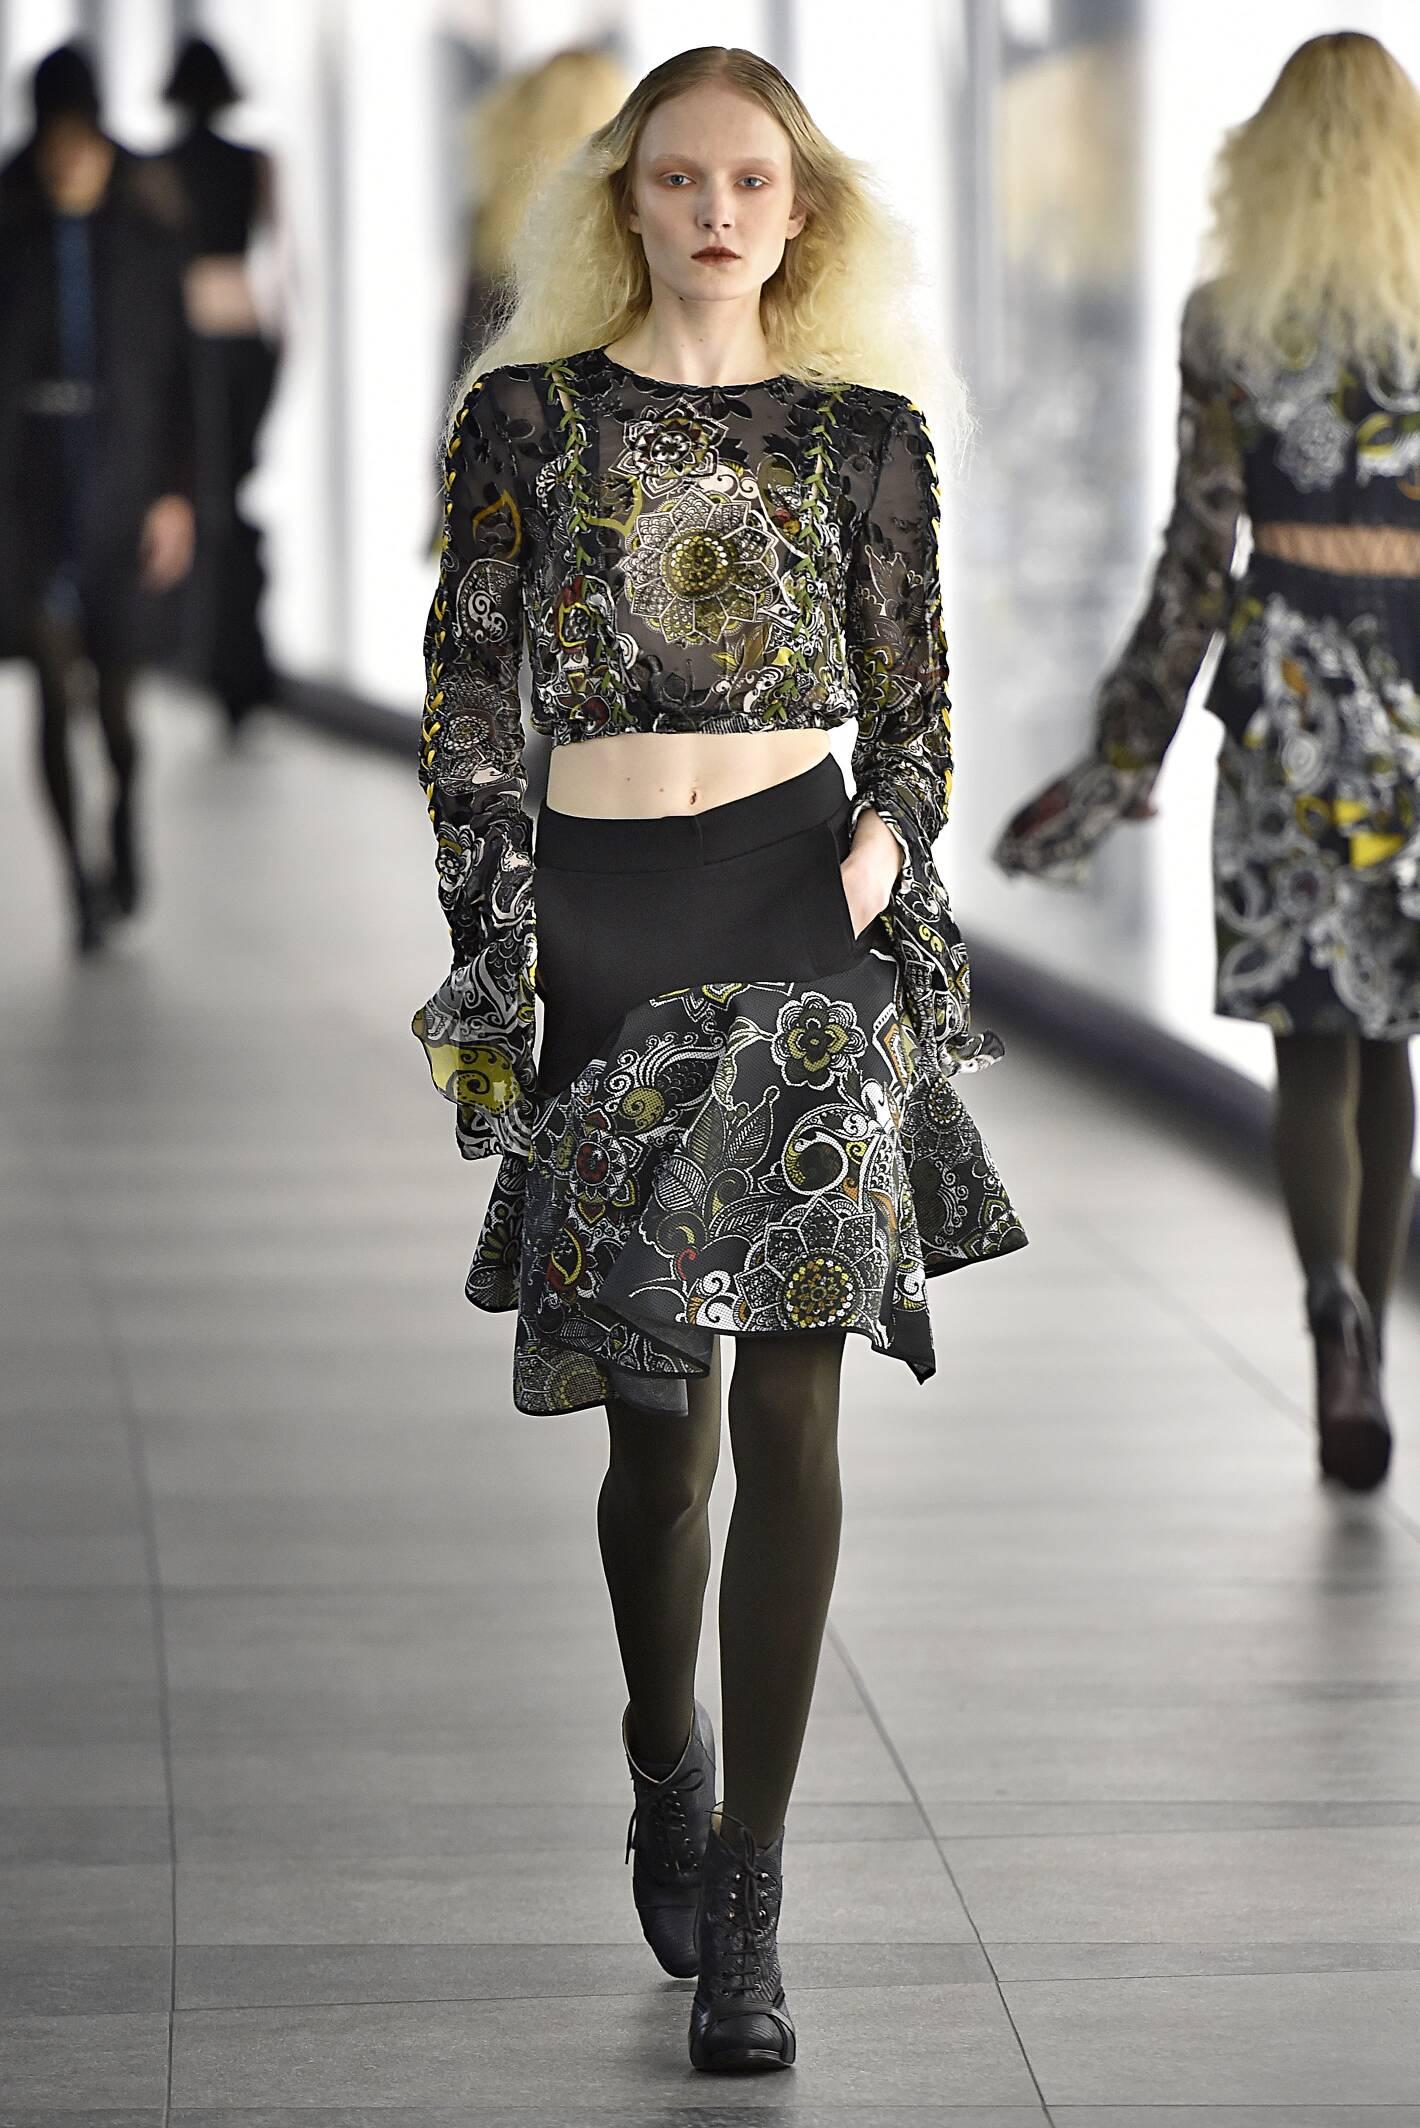 Winter Fashion Trends 2015 2016 Preen by Thornton Bregazzi Collection